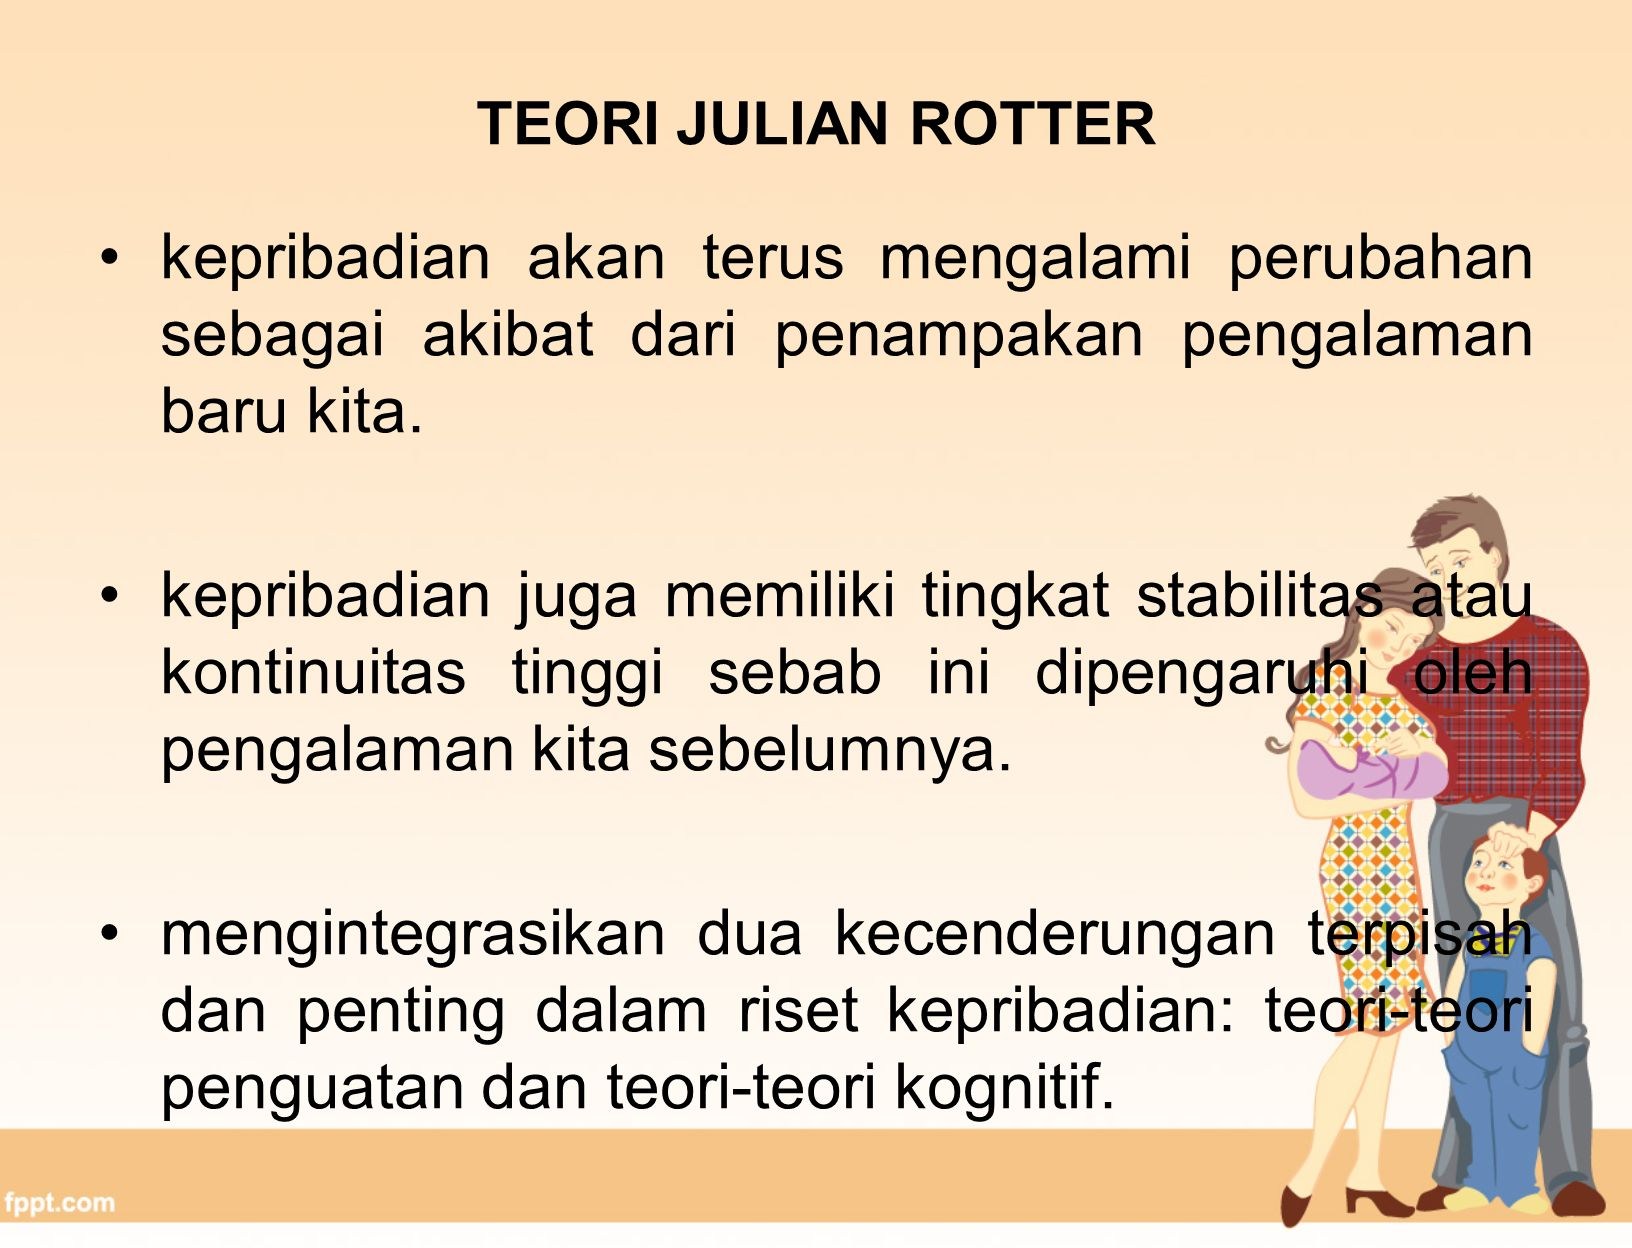 TEORI JULIAN ROTTER kepribadian akan terus mengalami perubahan sebagai akibat dari penampakan pengalaman baru kita.